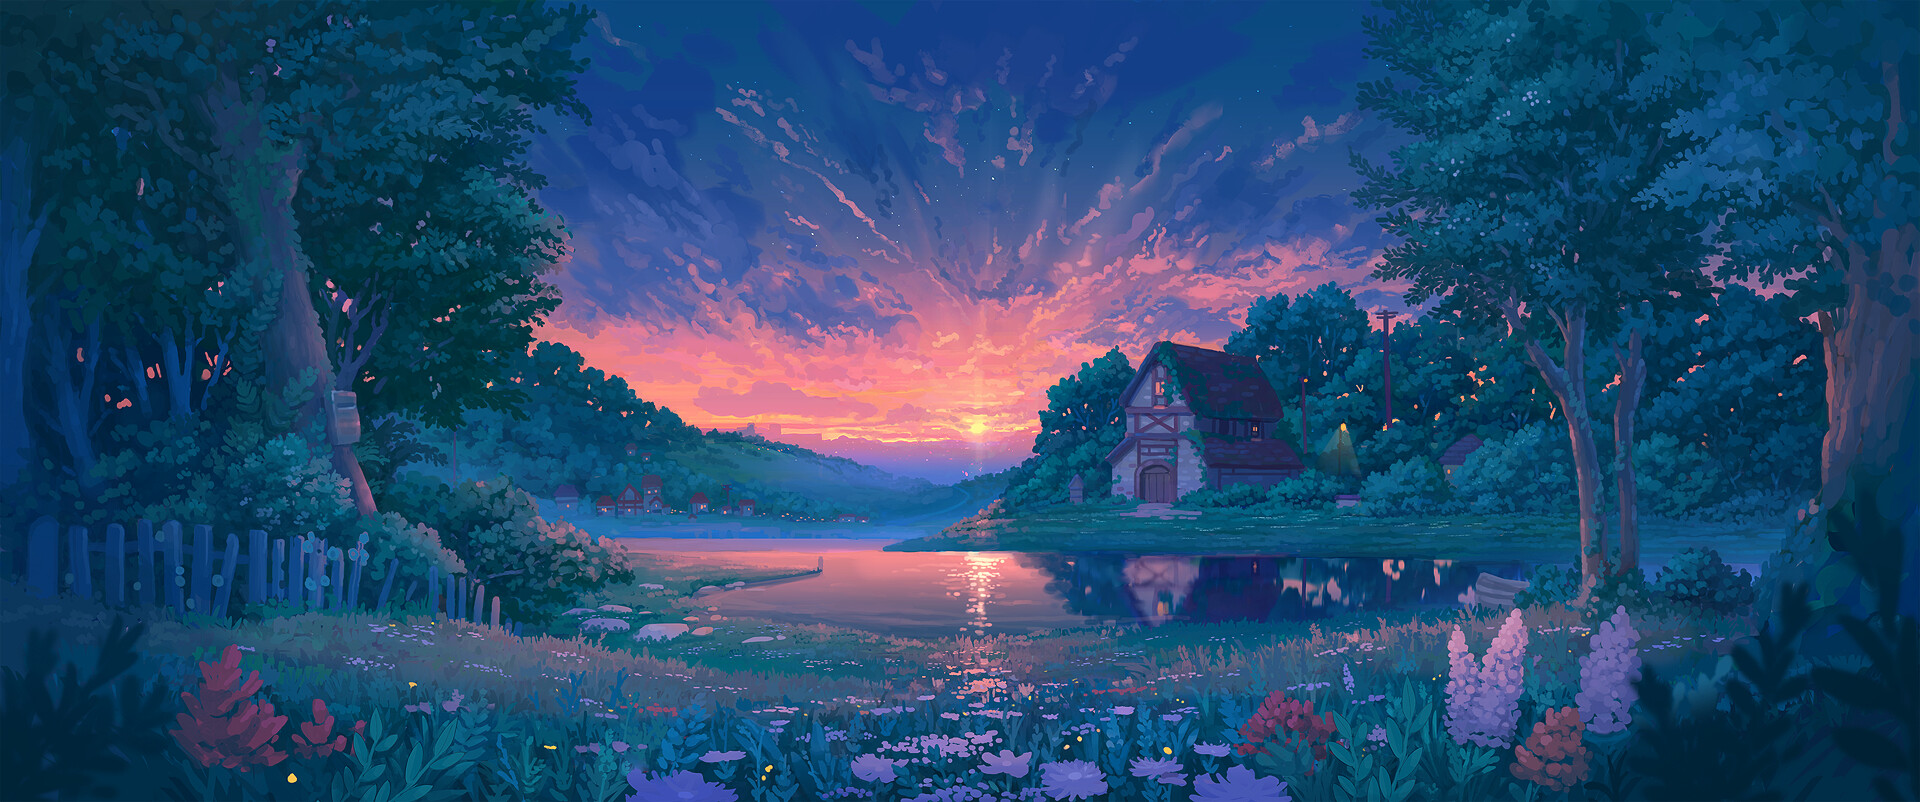 General 1920x802 Denis Istomin painting lake forest cottage sunrise lavender fence artwork fantasy art sky sunlight flowers plants